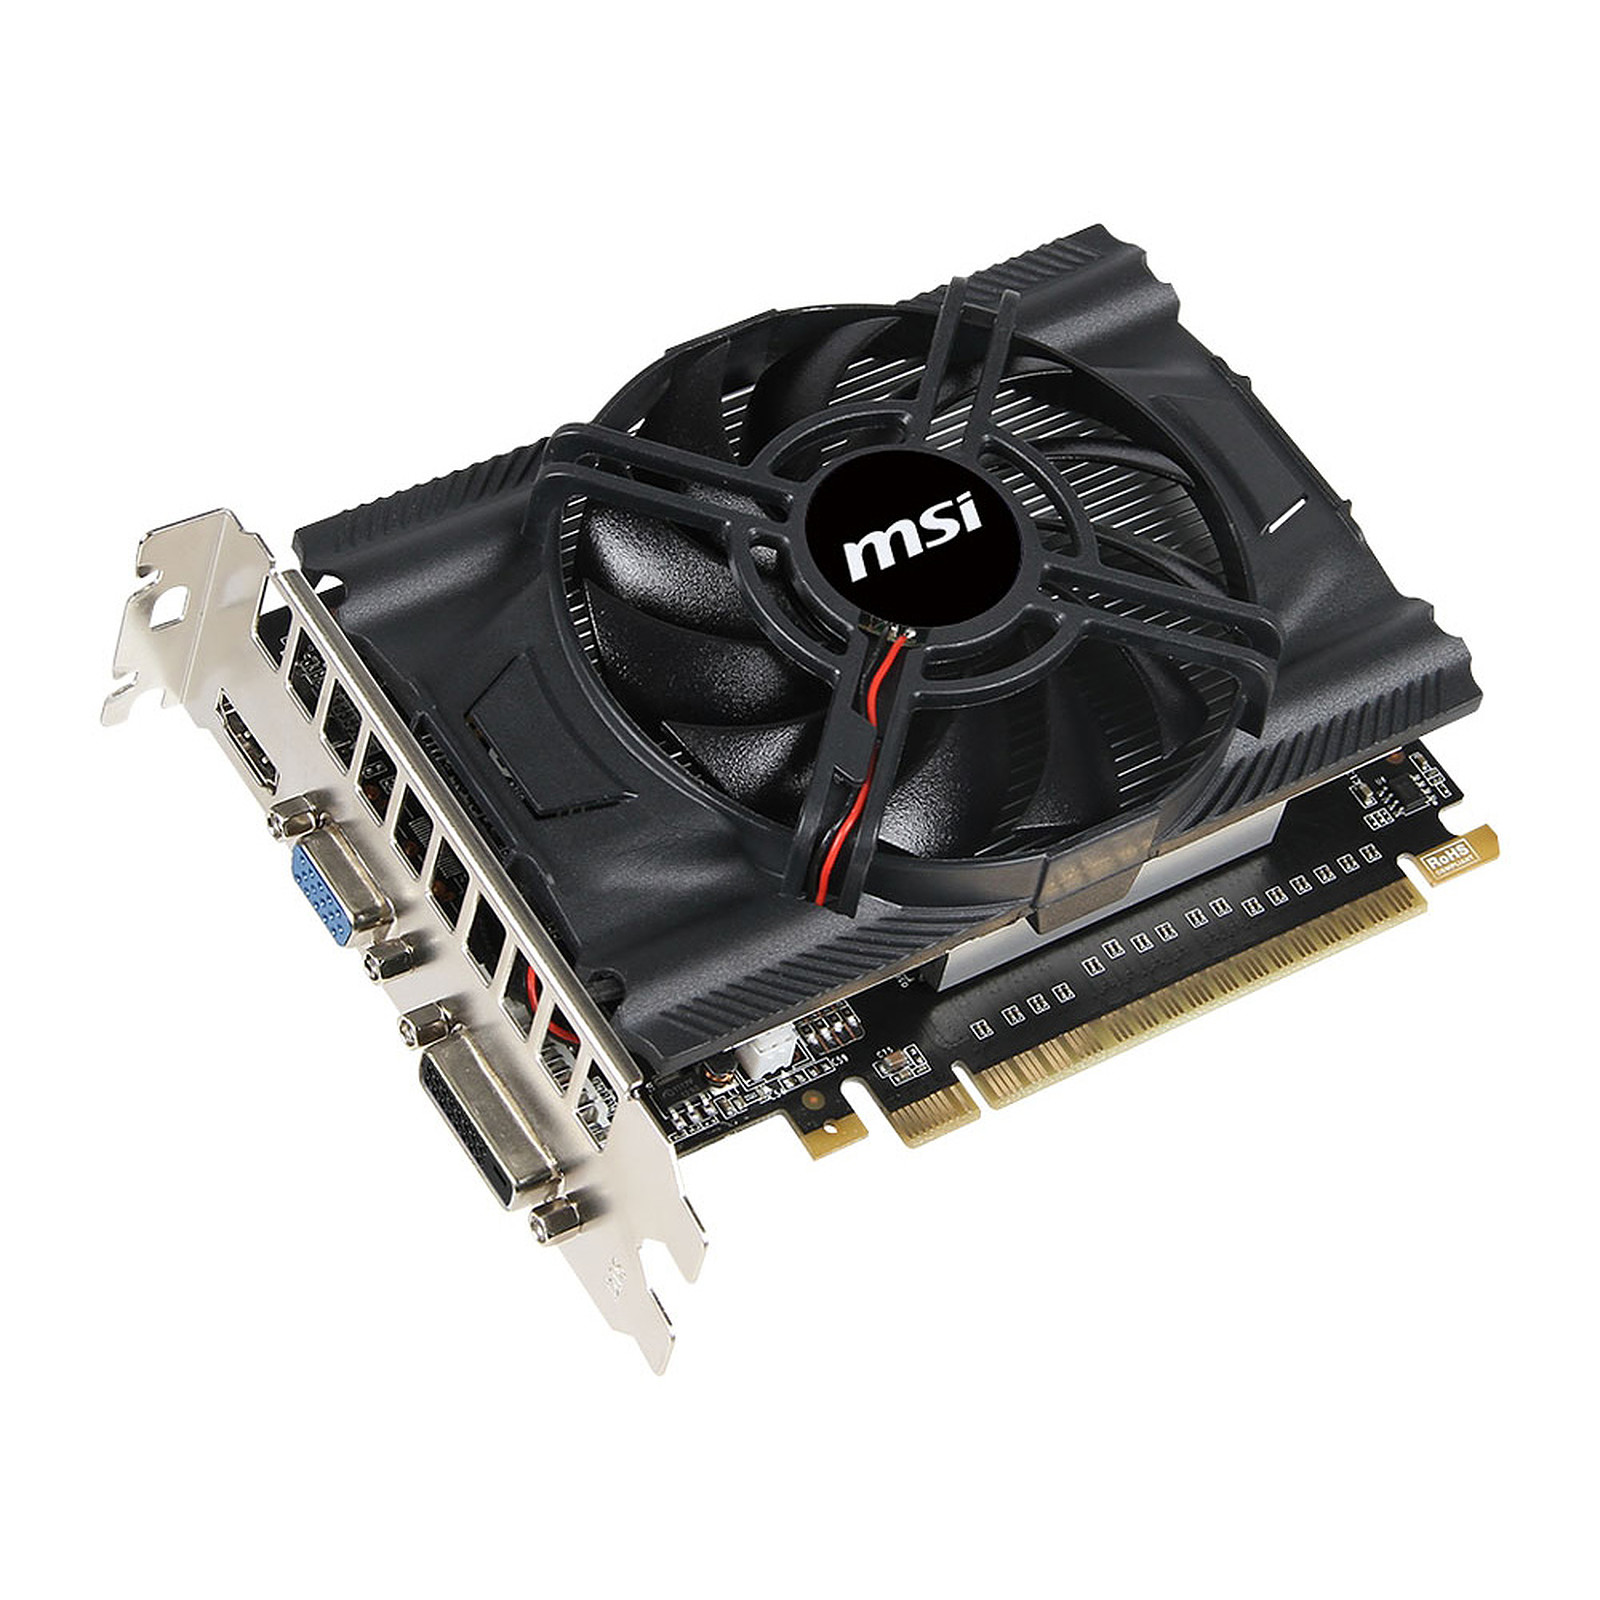 MSI GeForce GTX 650 N650-1GD5/OCV1